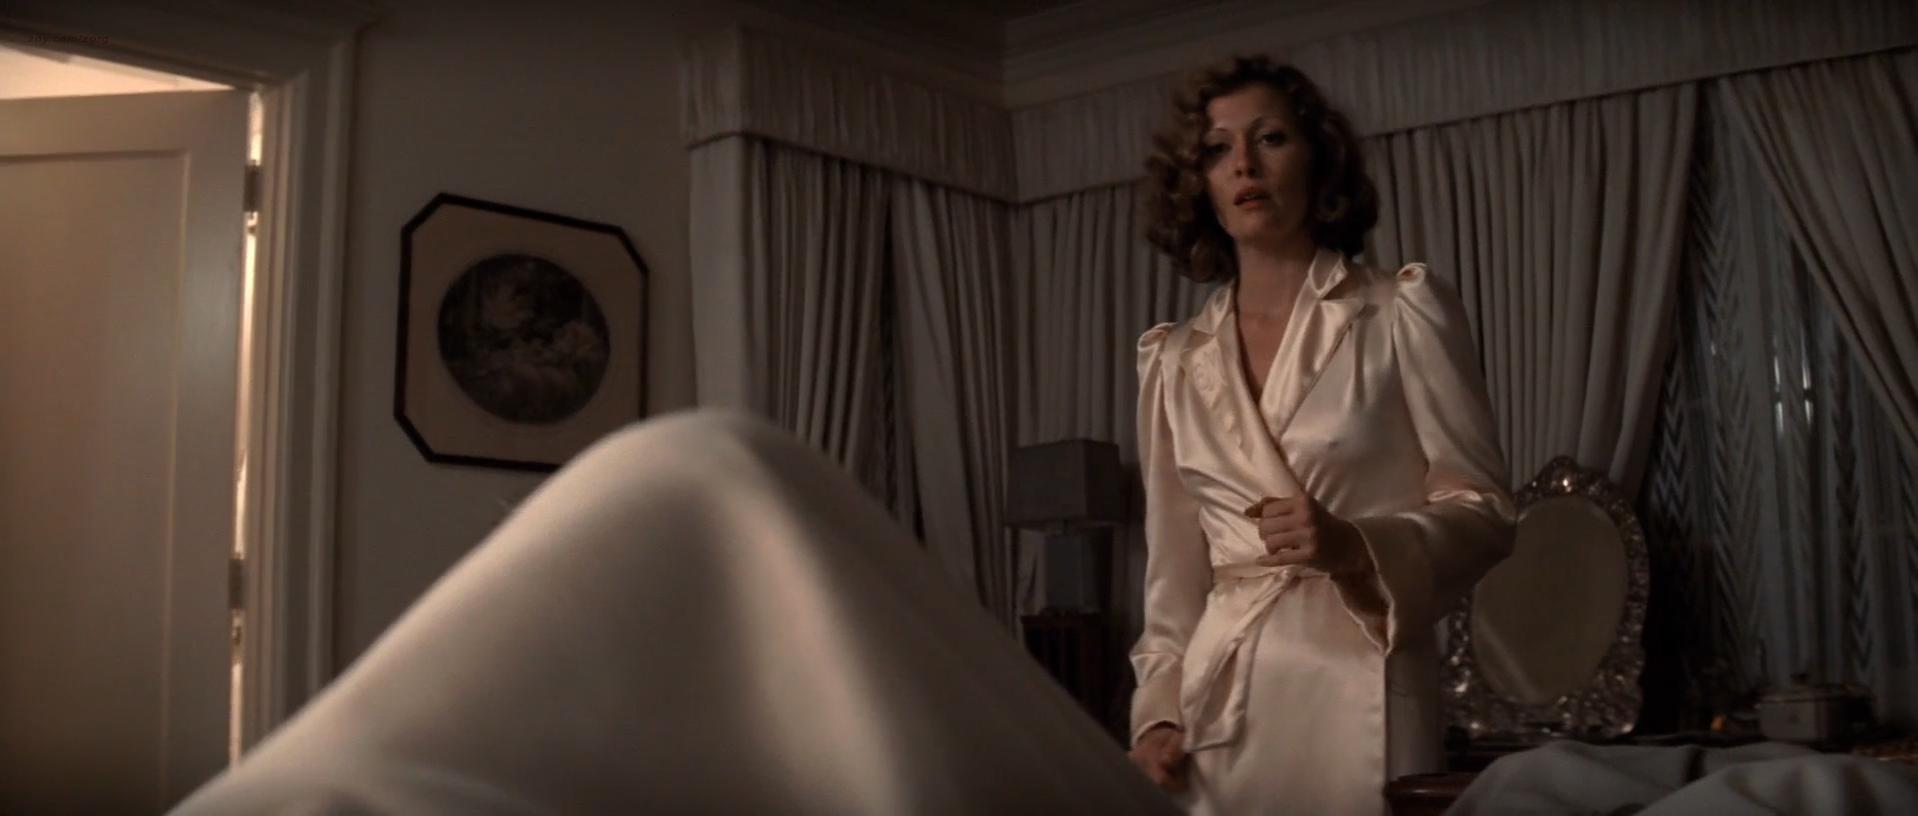 Watch Faye Dunaway Nude video